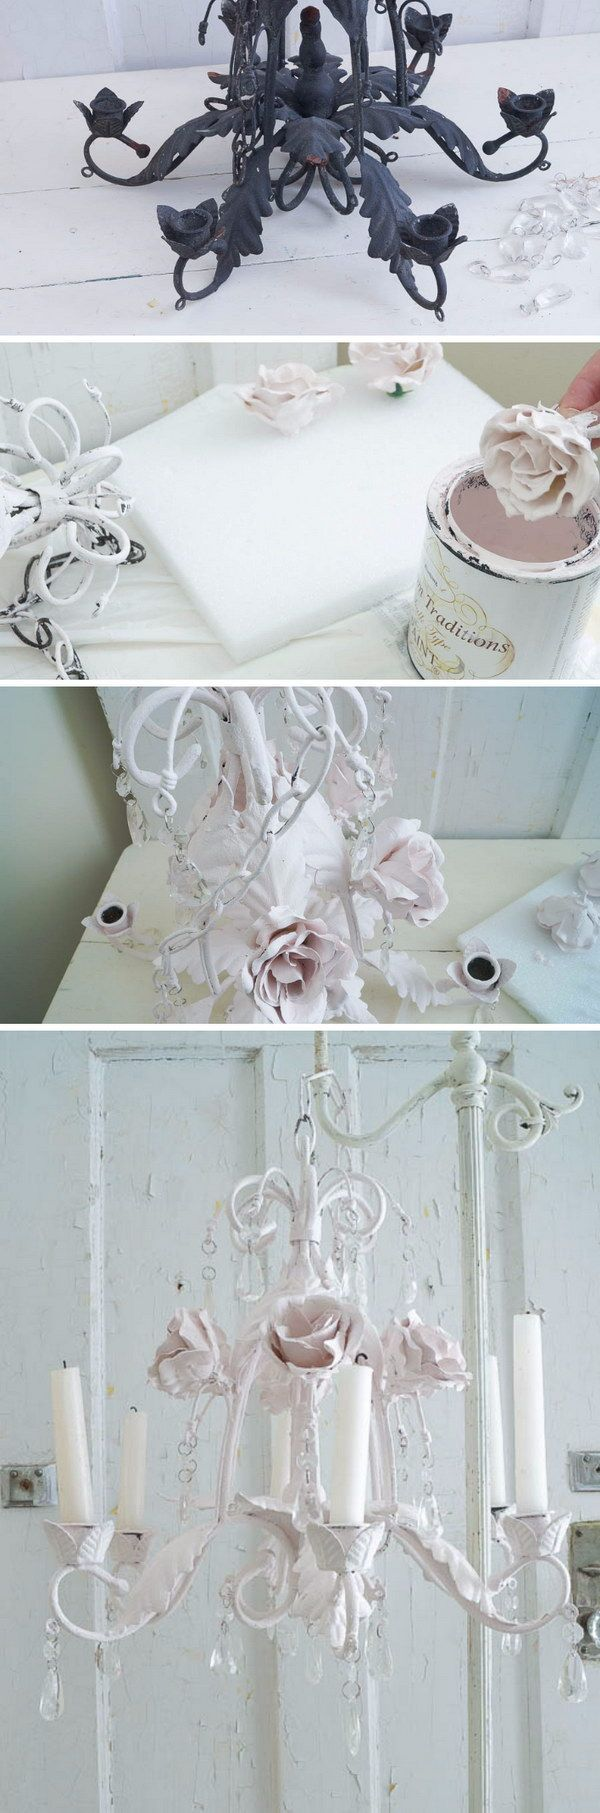 Romantic Shabby Chic DIY Project Ideas & Tutorials | Home ...